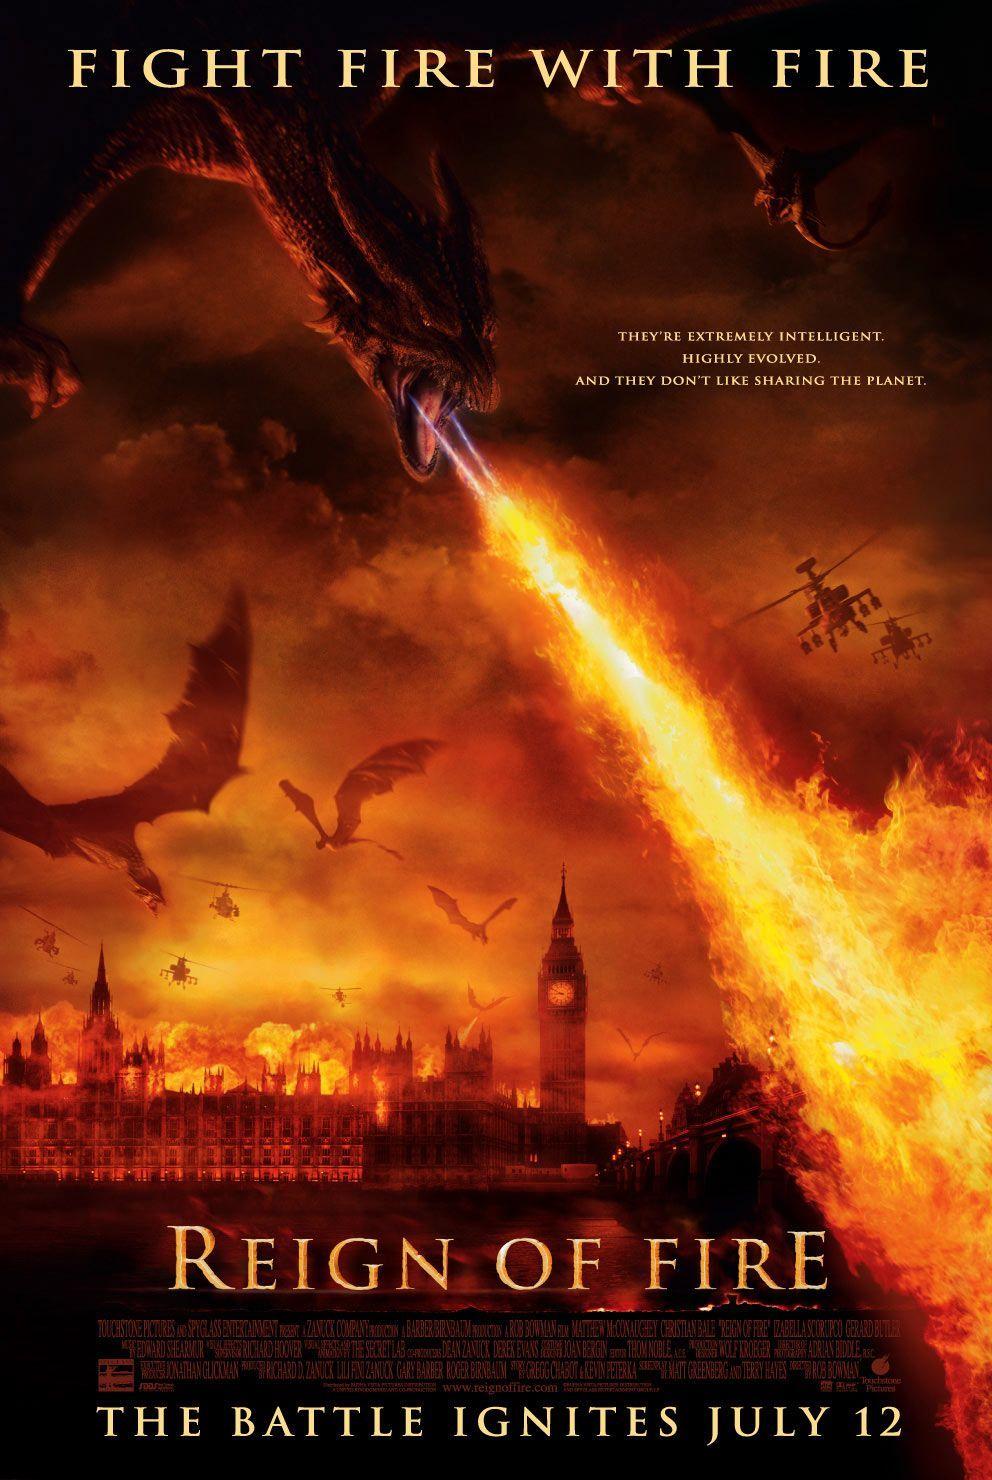 Reign Of Fire PG-13 2002 ‧ Disaster Film/Fantasy